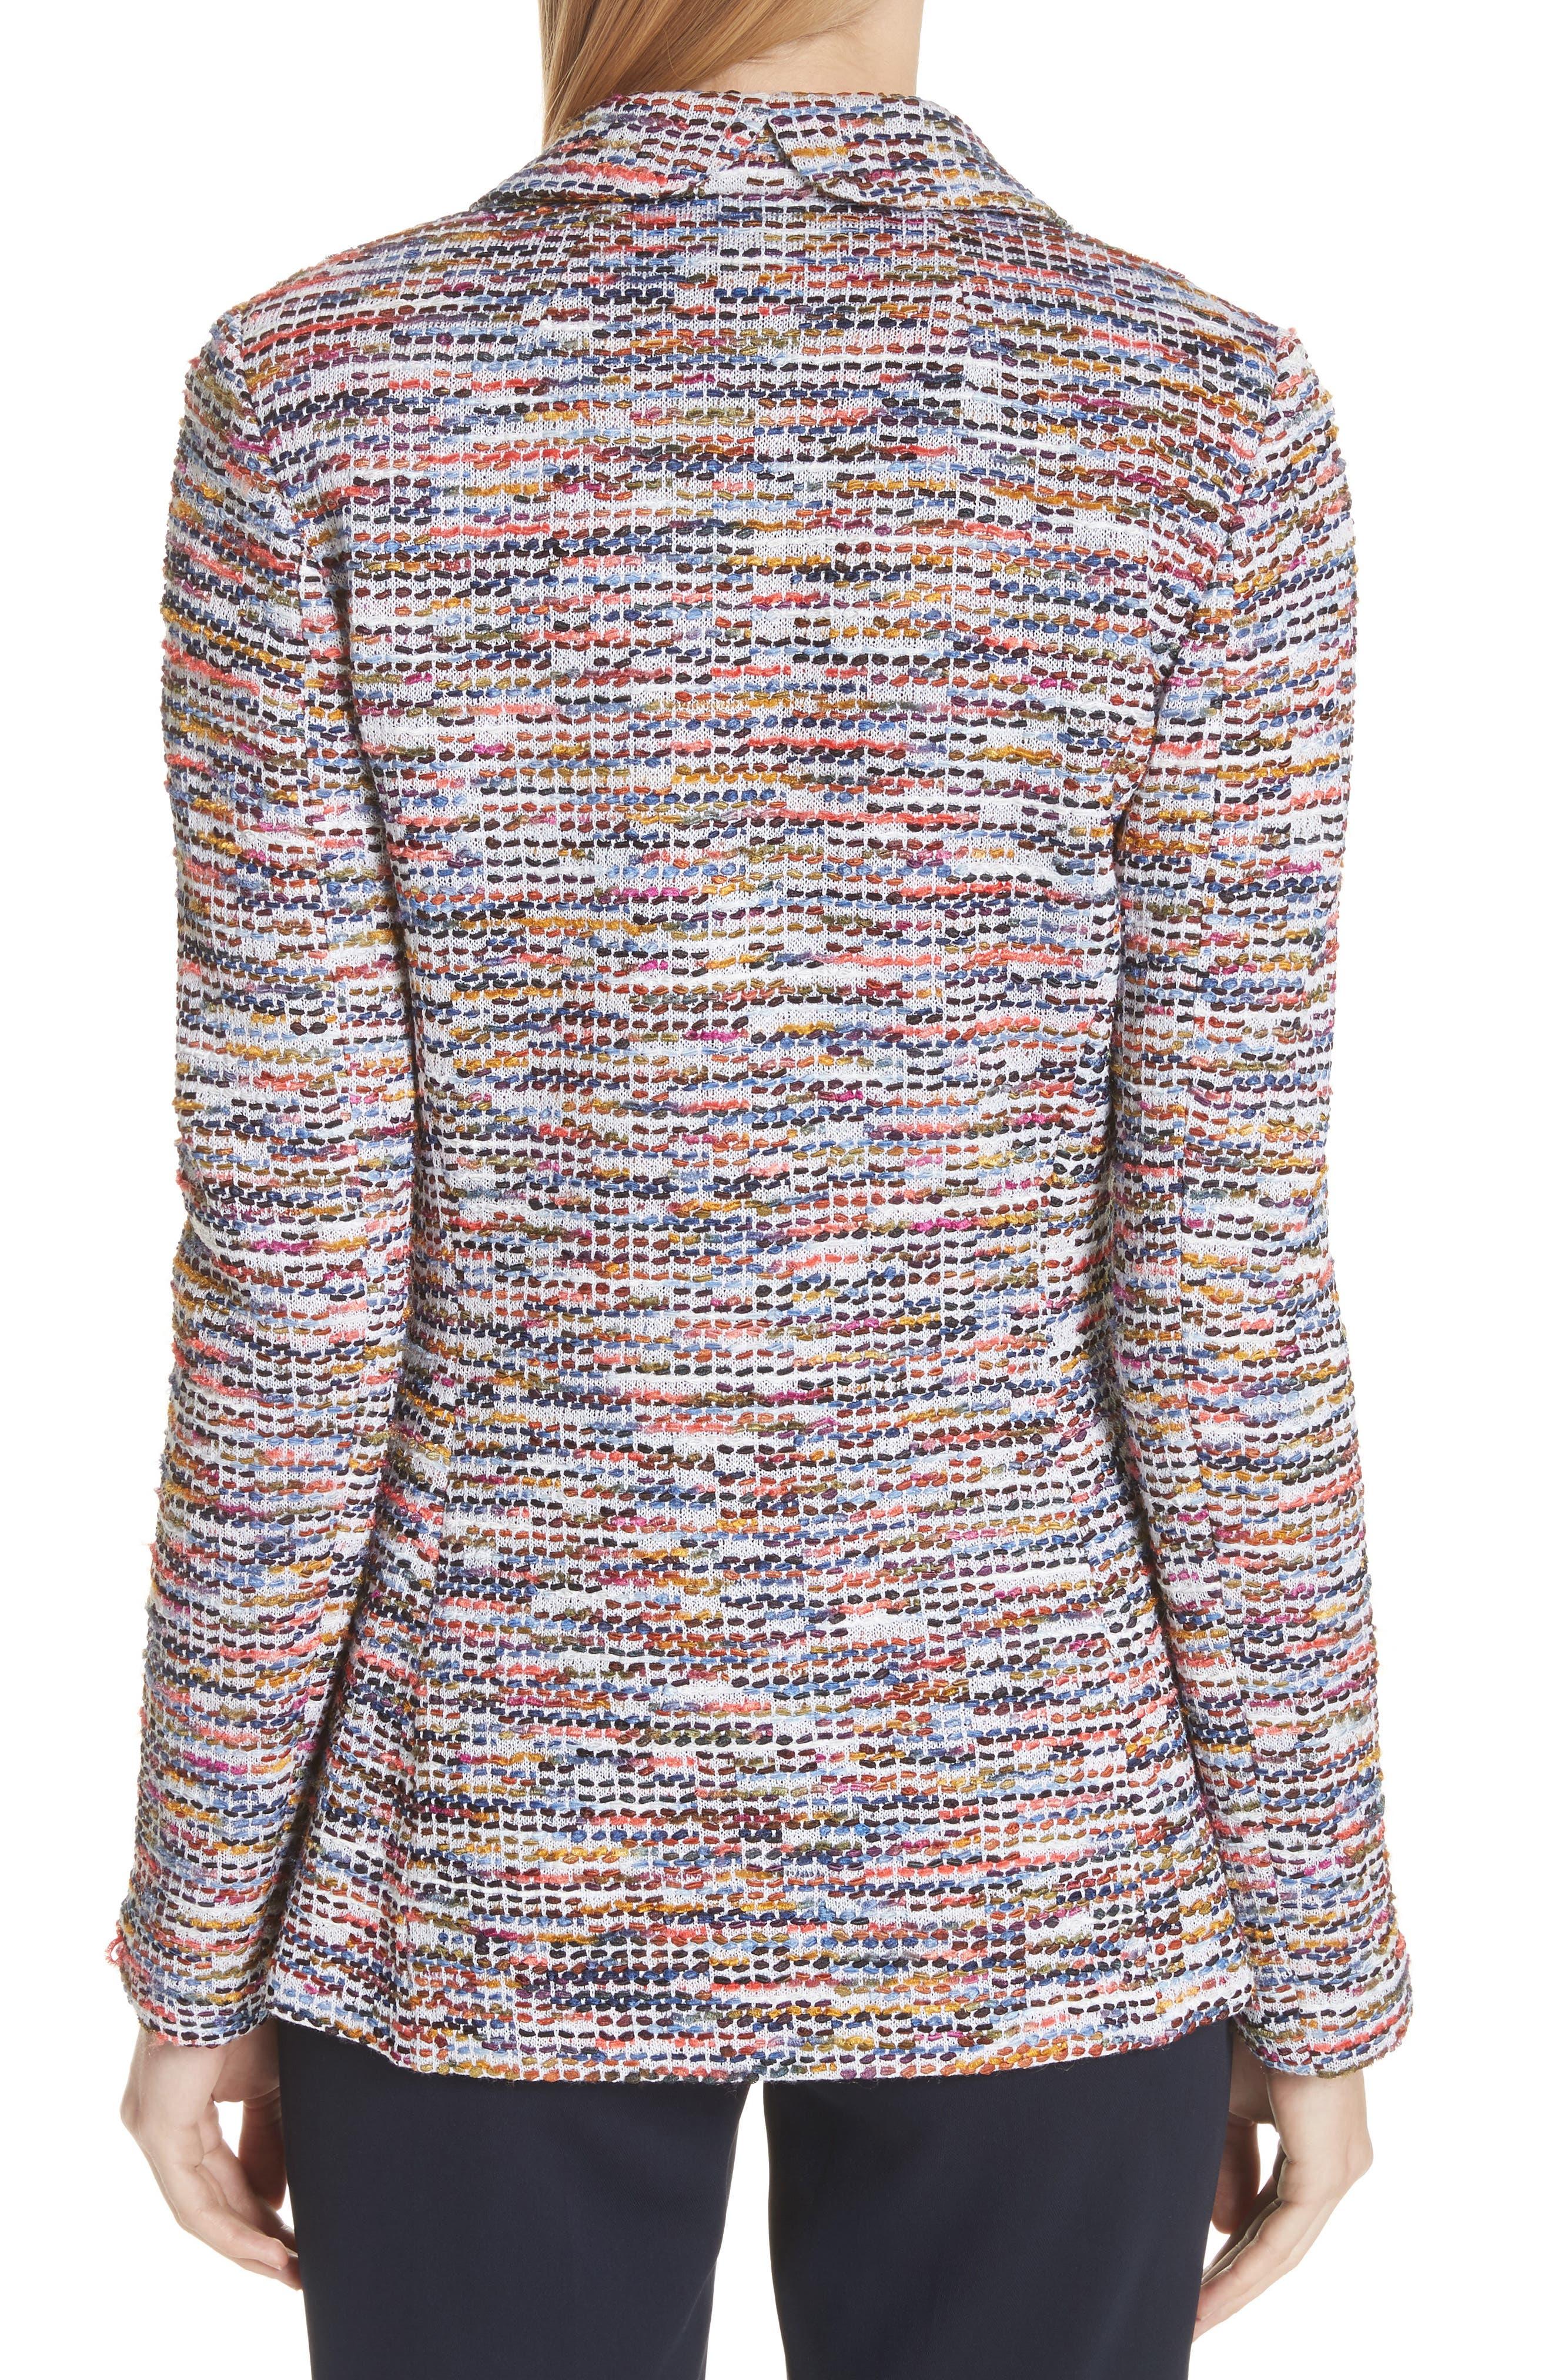 Vertical Fringe Multi Tweed Knit Jacket,                             Alternate thumbnail 2, color,                             Sienna Multi